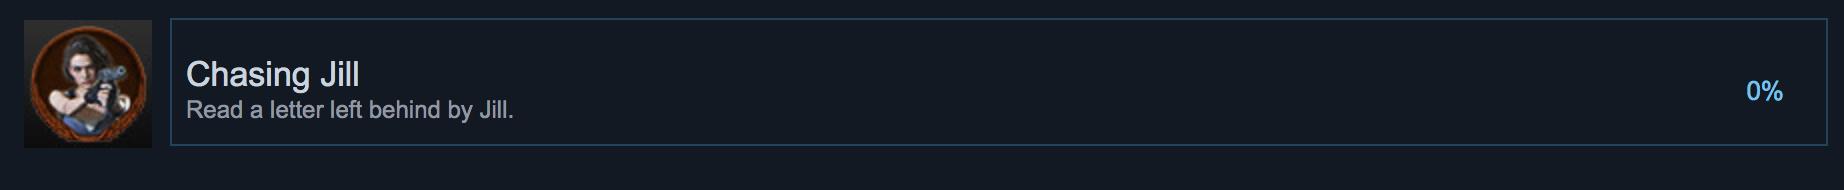 resident evil 2 remake update